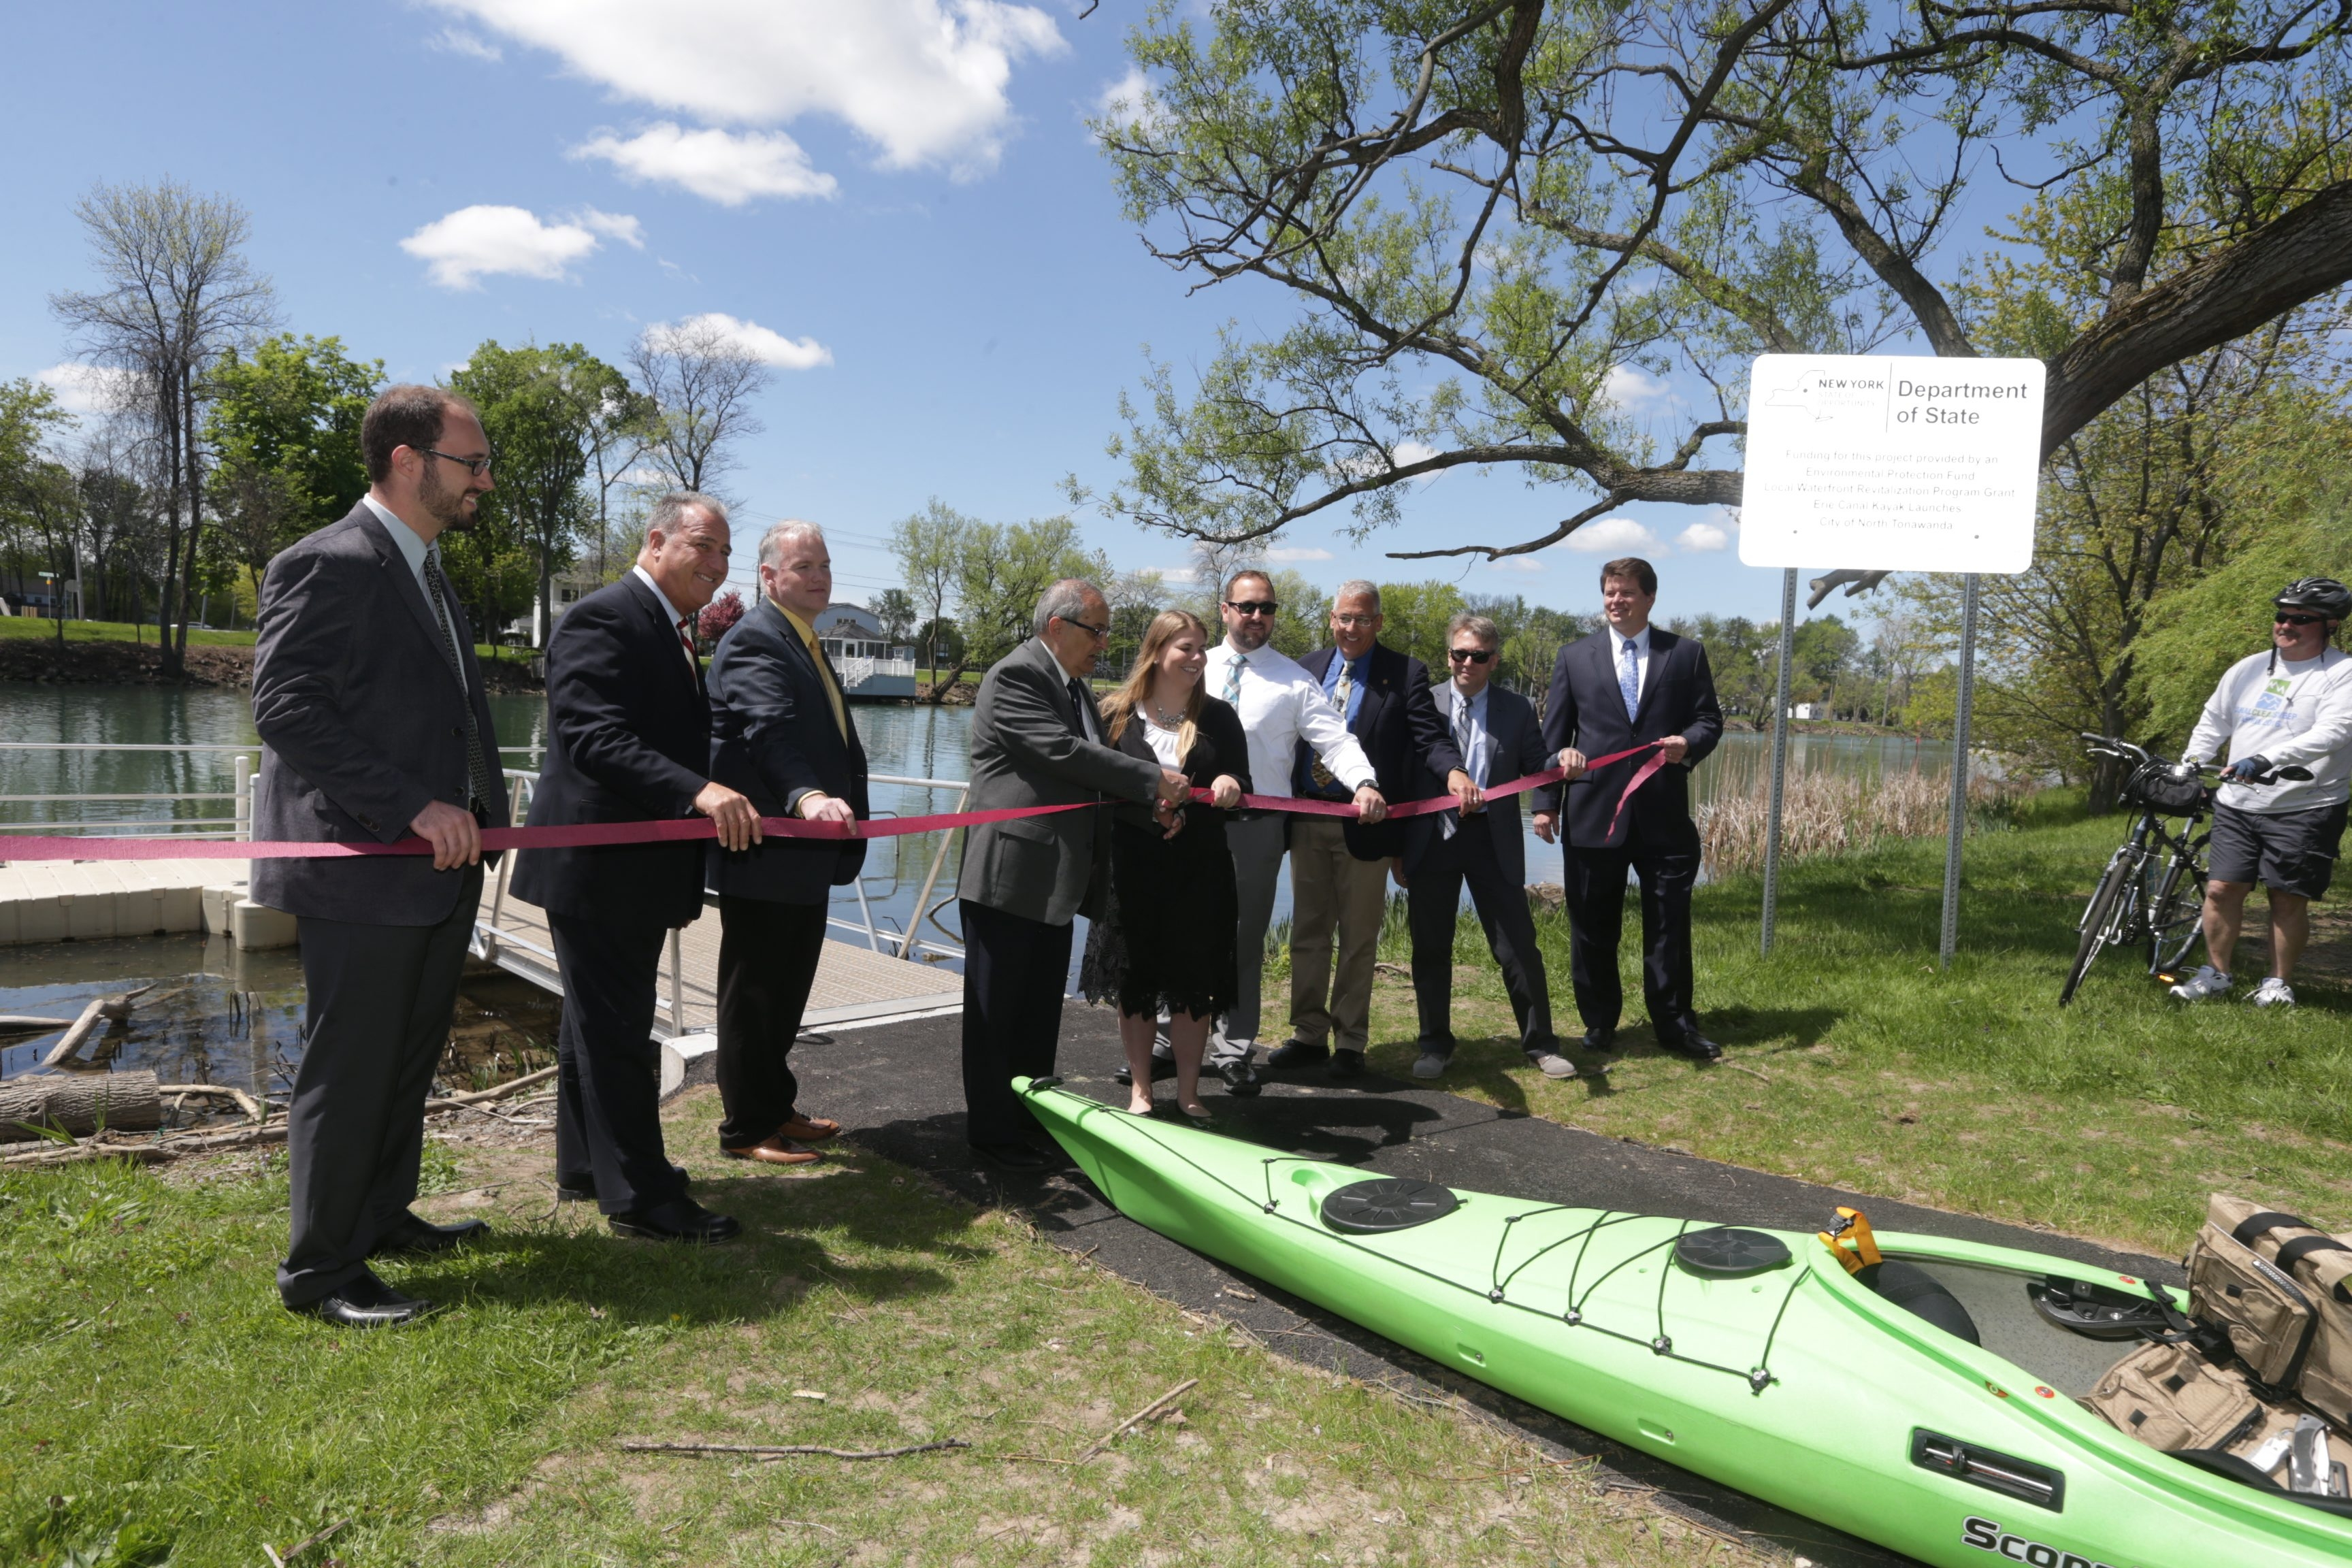 Arthur G. Pappas, Mayor of North Tonawanda and other dignitaries cut a ribbon and opened a new   Bike Path and Kayak Launch at the foot of Niagara at Sweeney Street, in North Tonawanda, N.Y., on Wednesday May 18, 2016.   (John Hickey/Buffalo News)